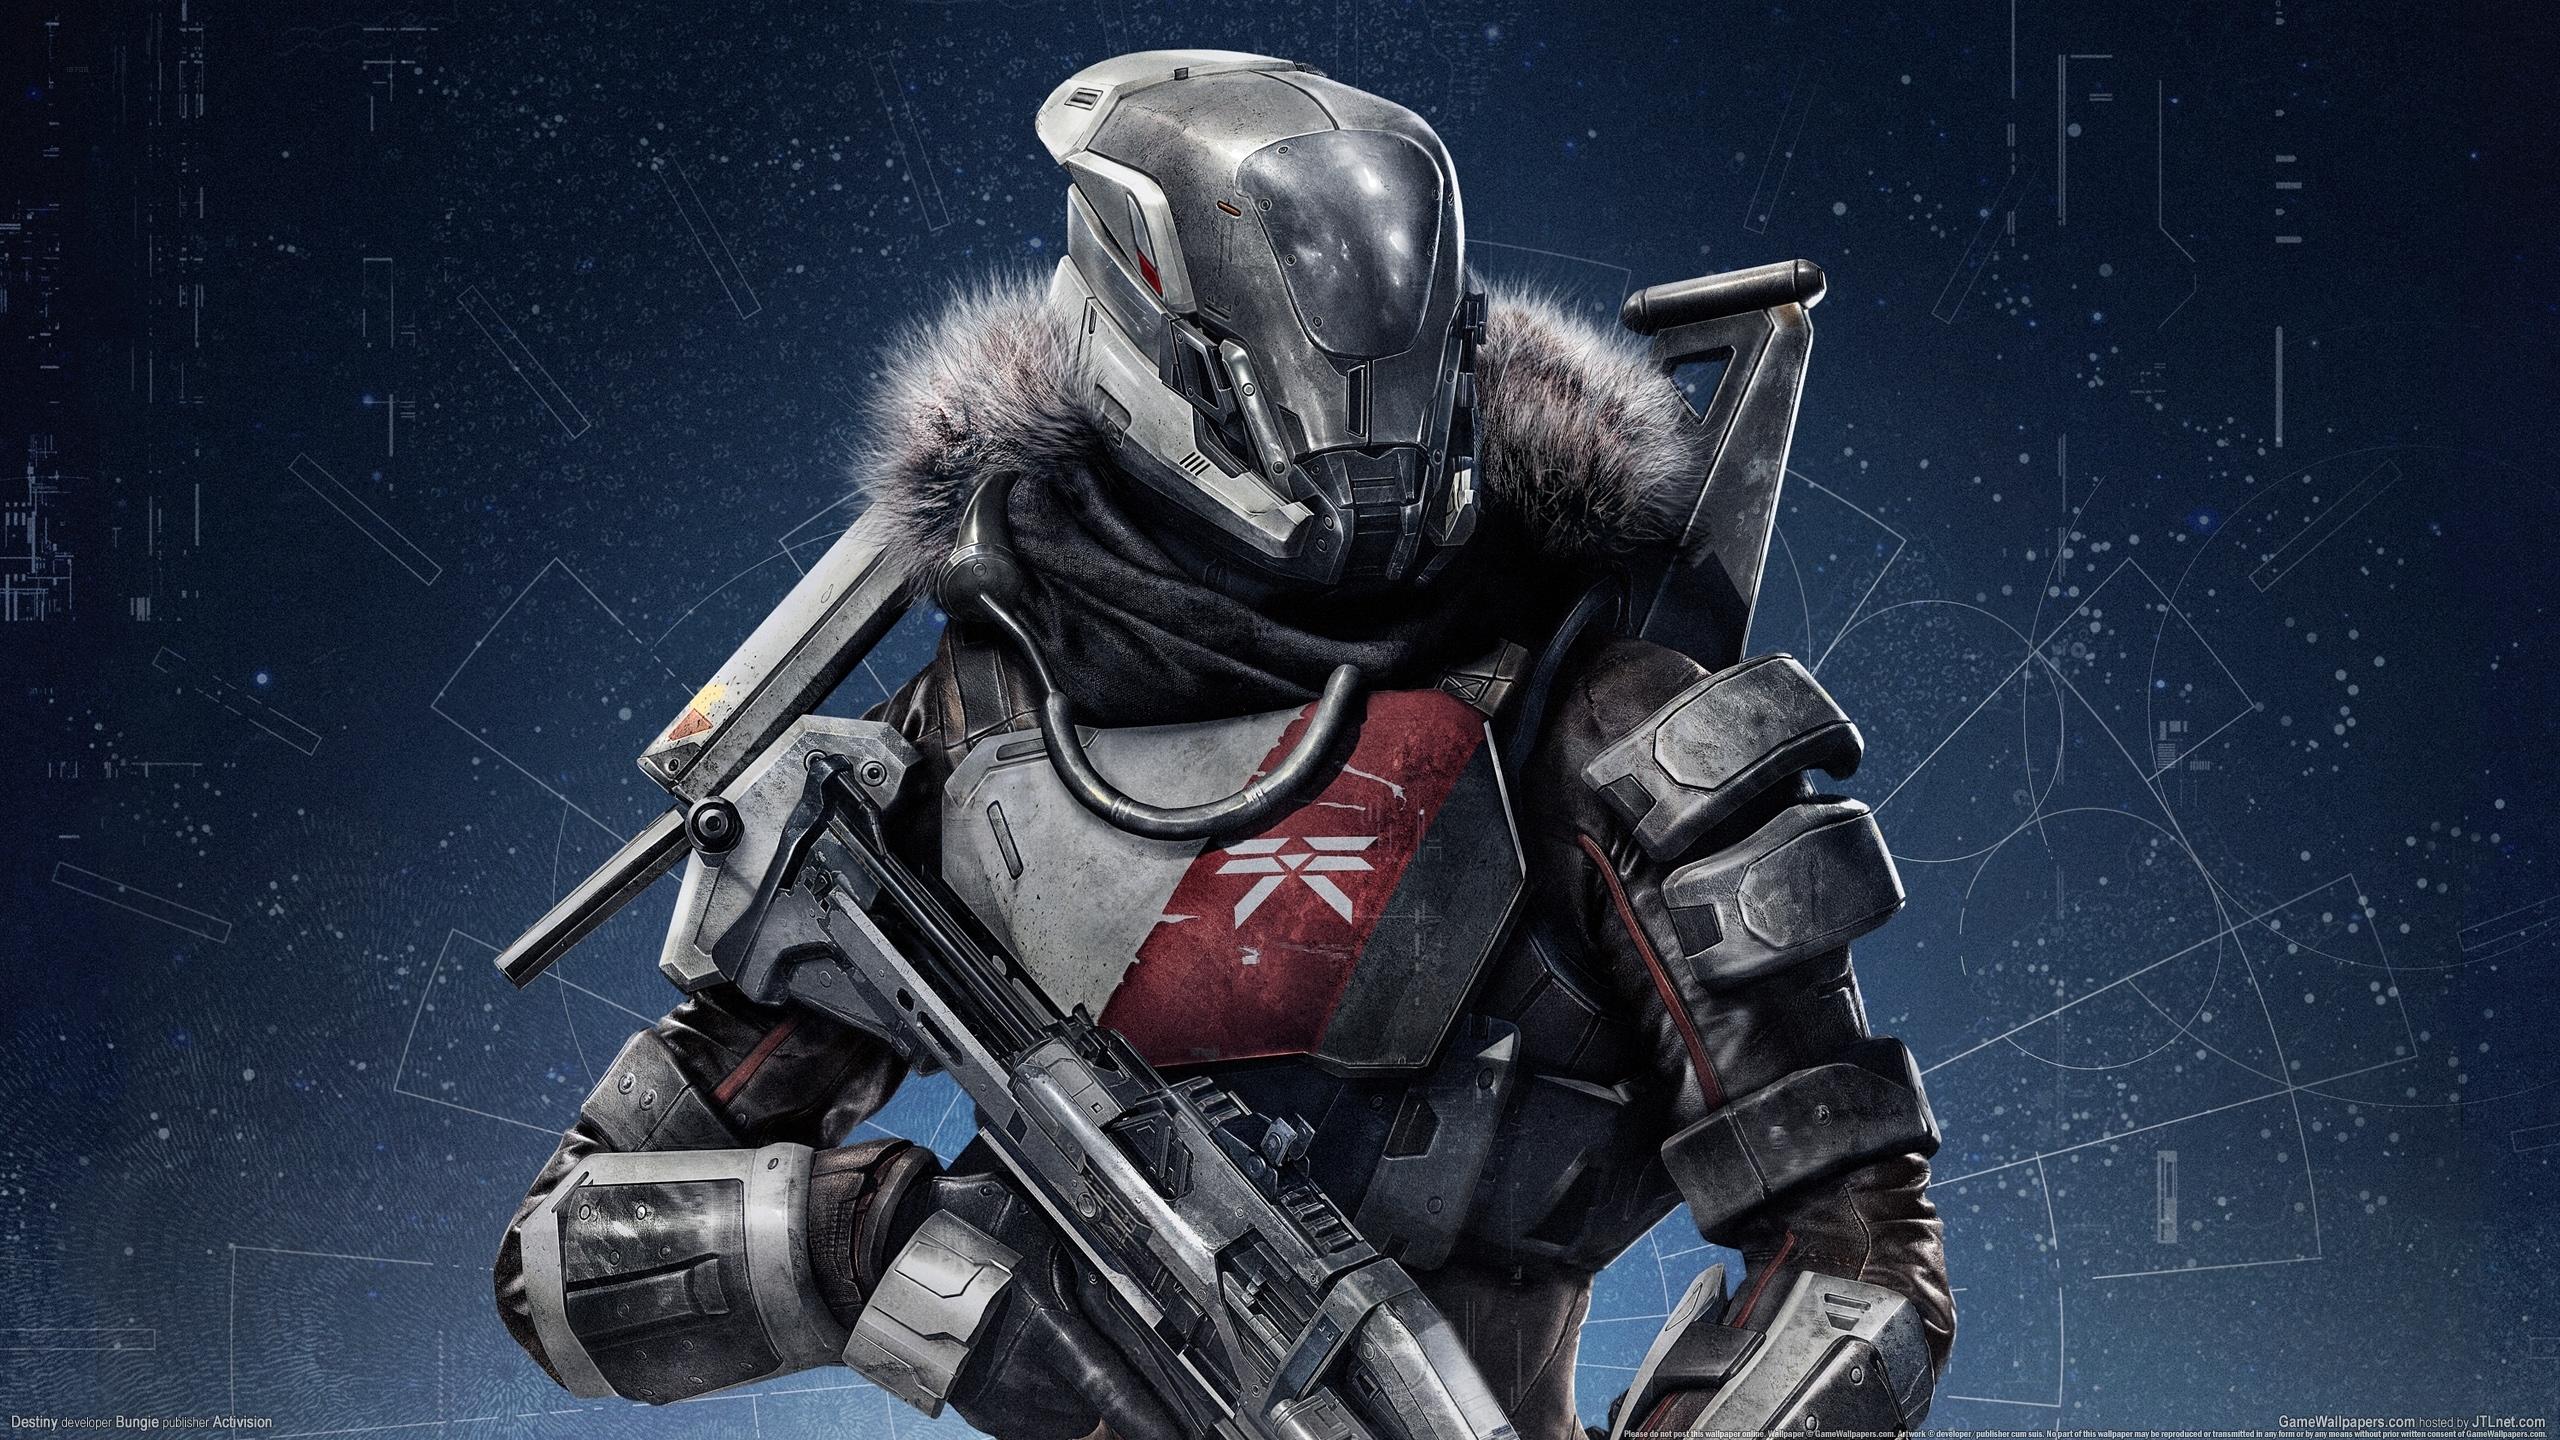 Destiny Warrior Armor sci fi cyborg robot weapon gun wallpaper 2560x1440